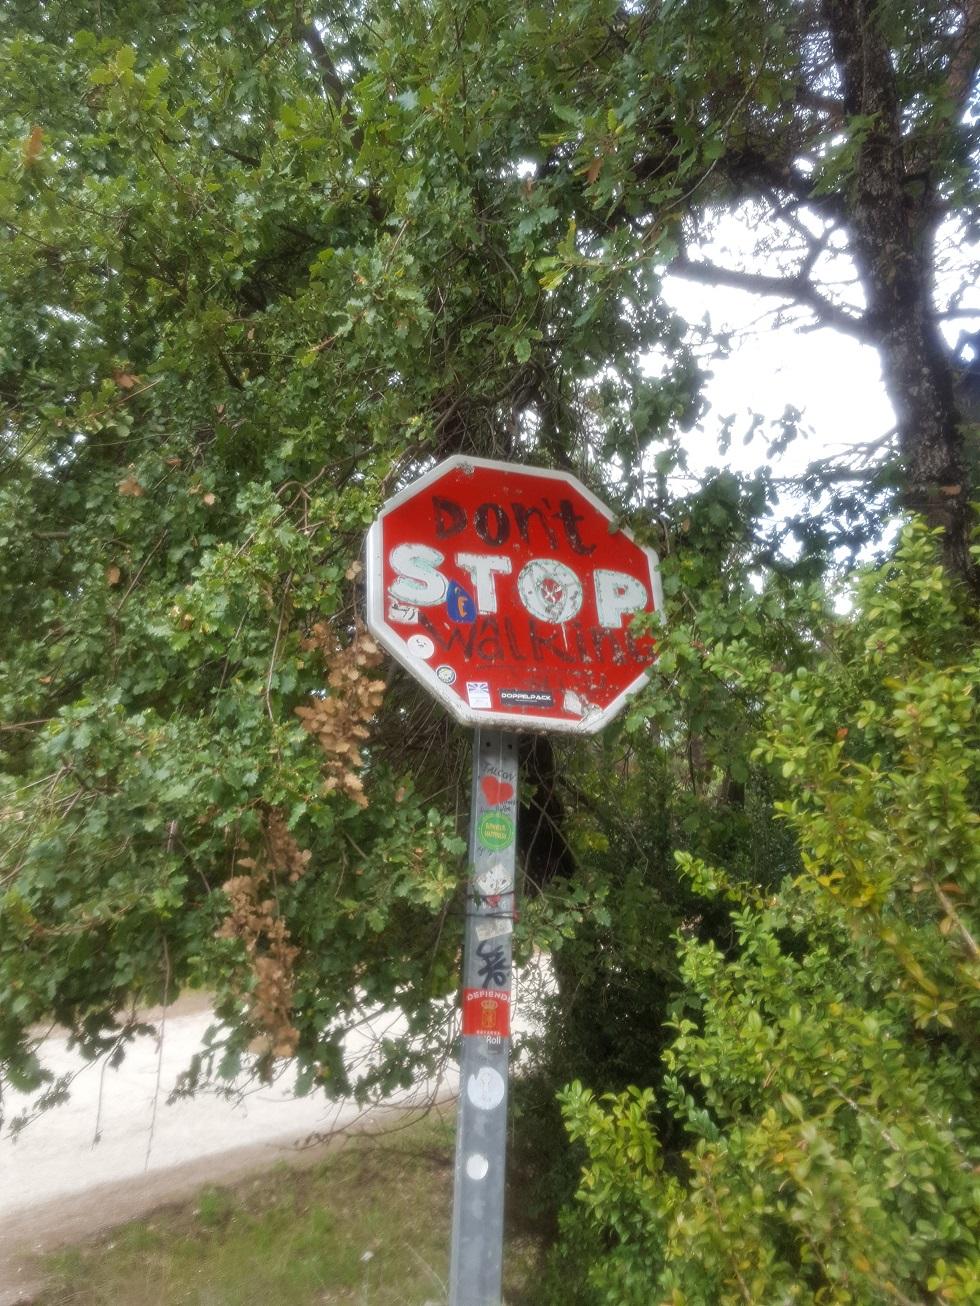 mp_don_t_stop_walking.jpg